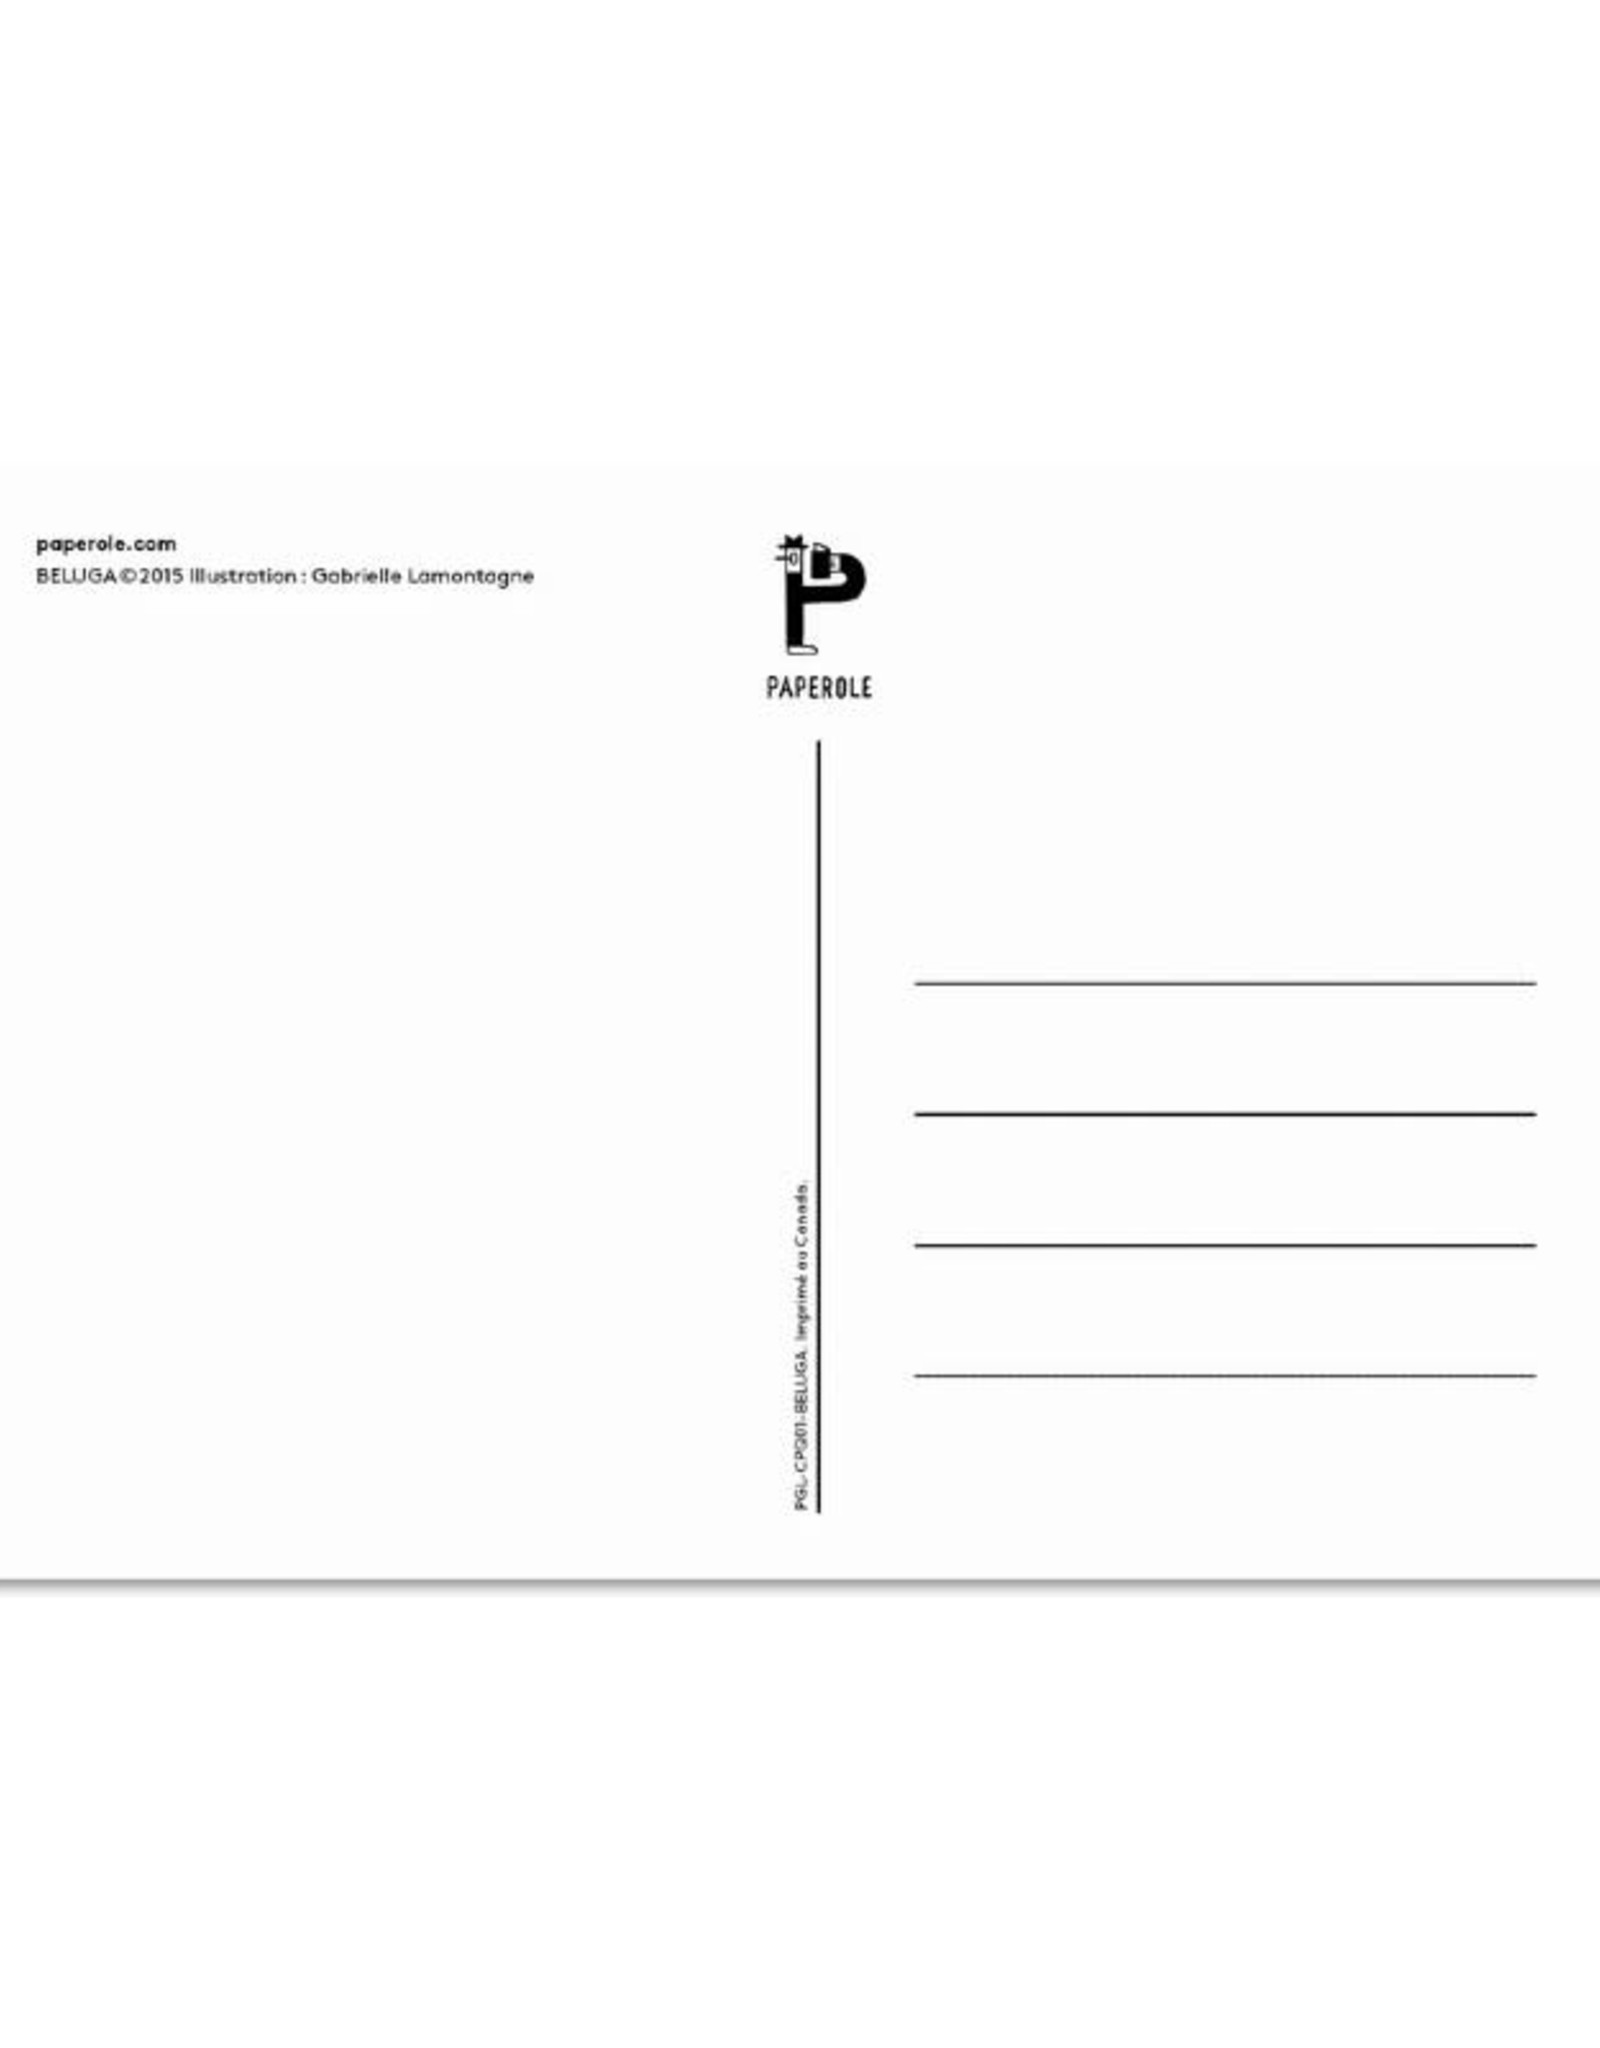 Paperole Carte postale Paperole Béluga